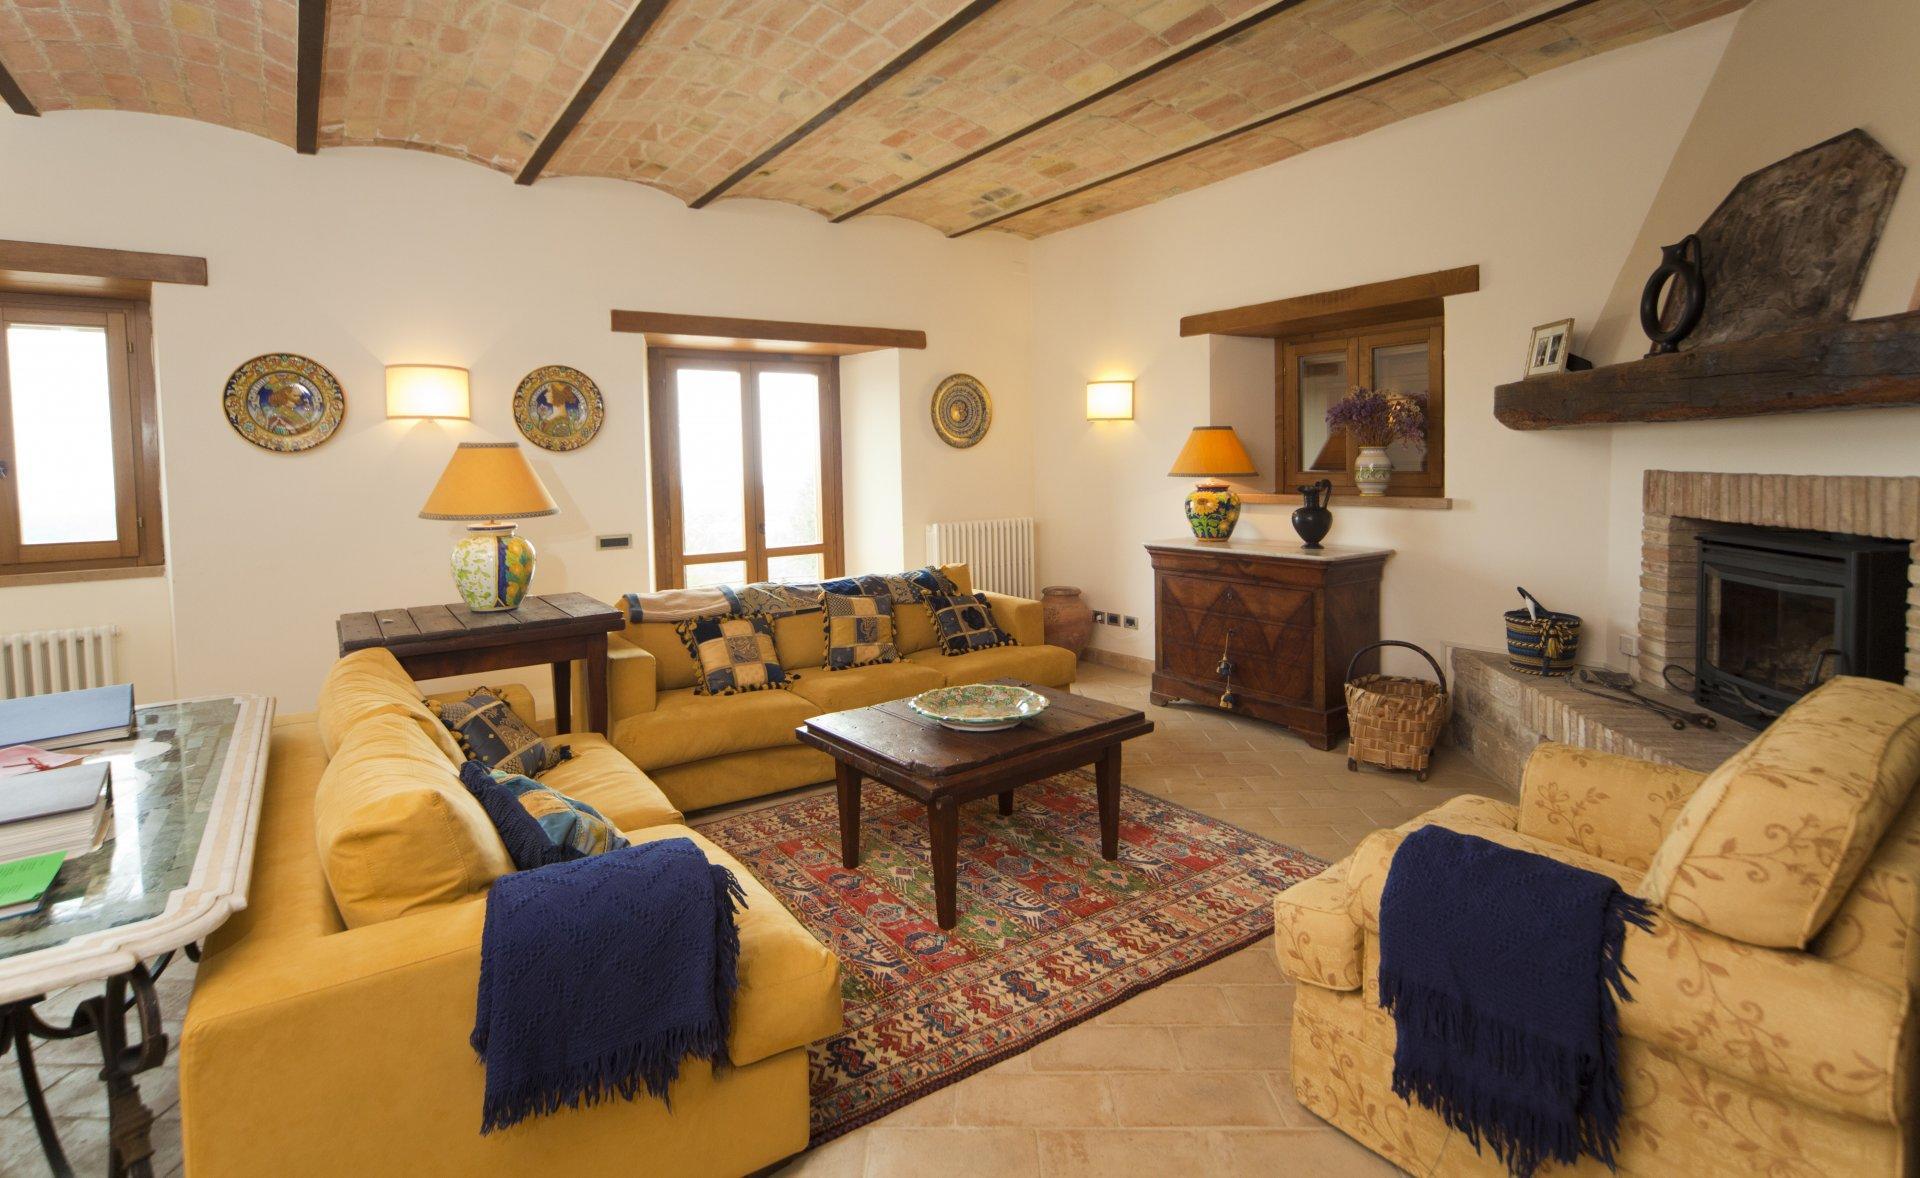 Living room with Fireplace, Domus Romana, Todi, Umbria.